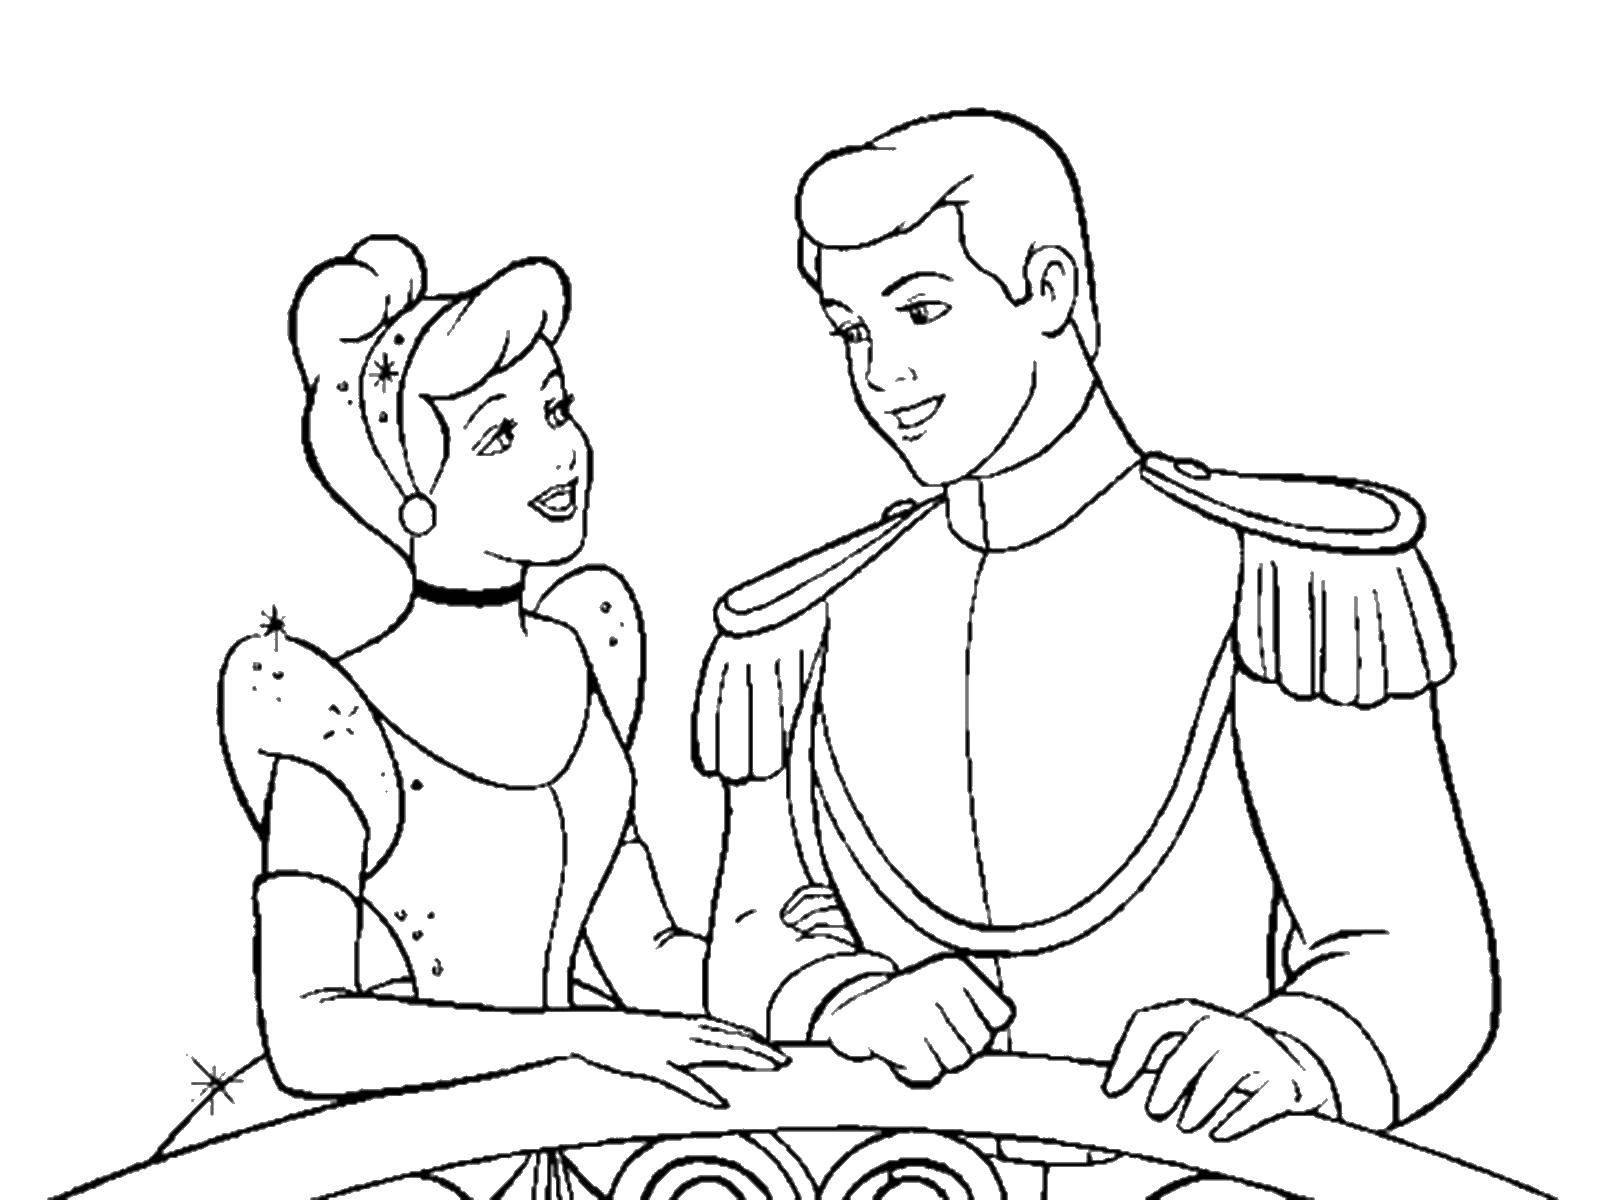 Coloring sheet Cinderella Download Christmas, deer, new year,.  Print